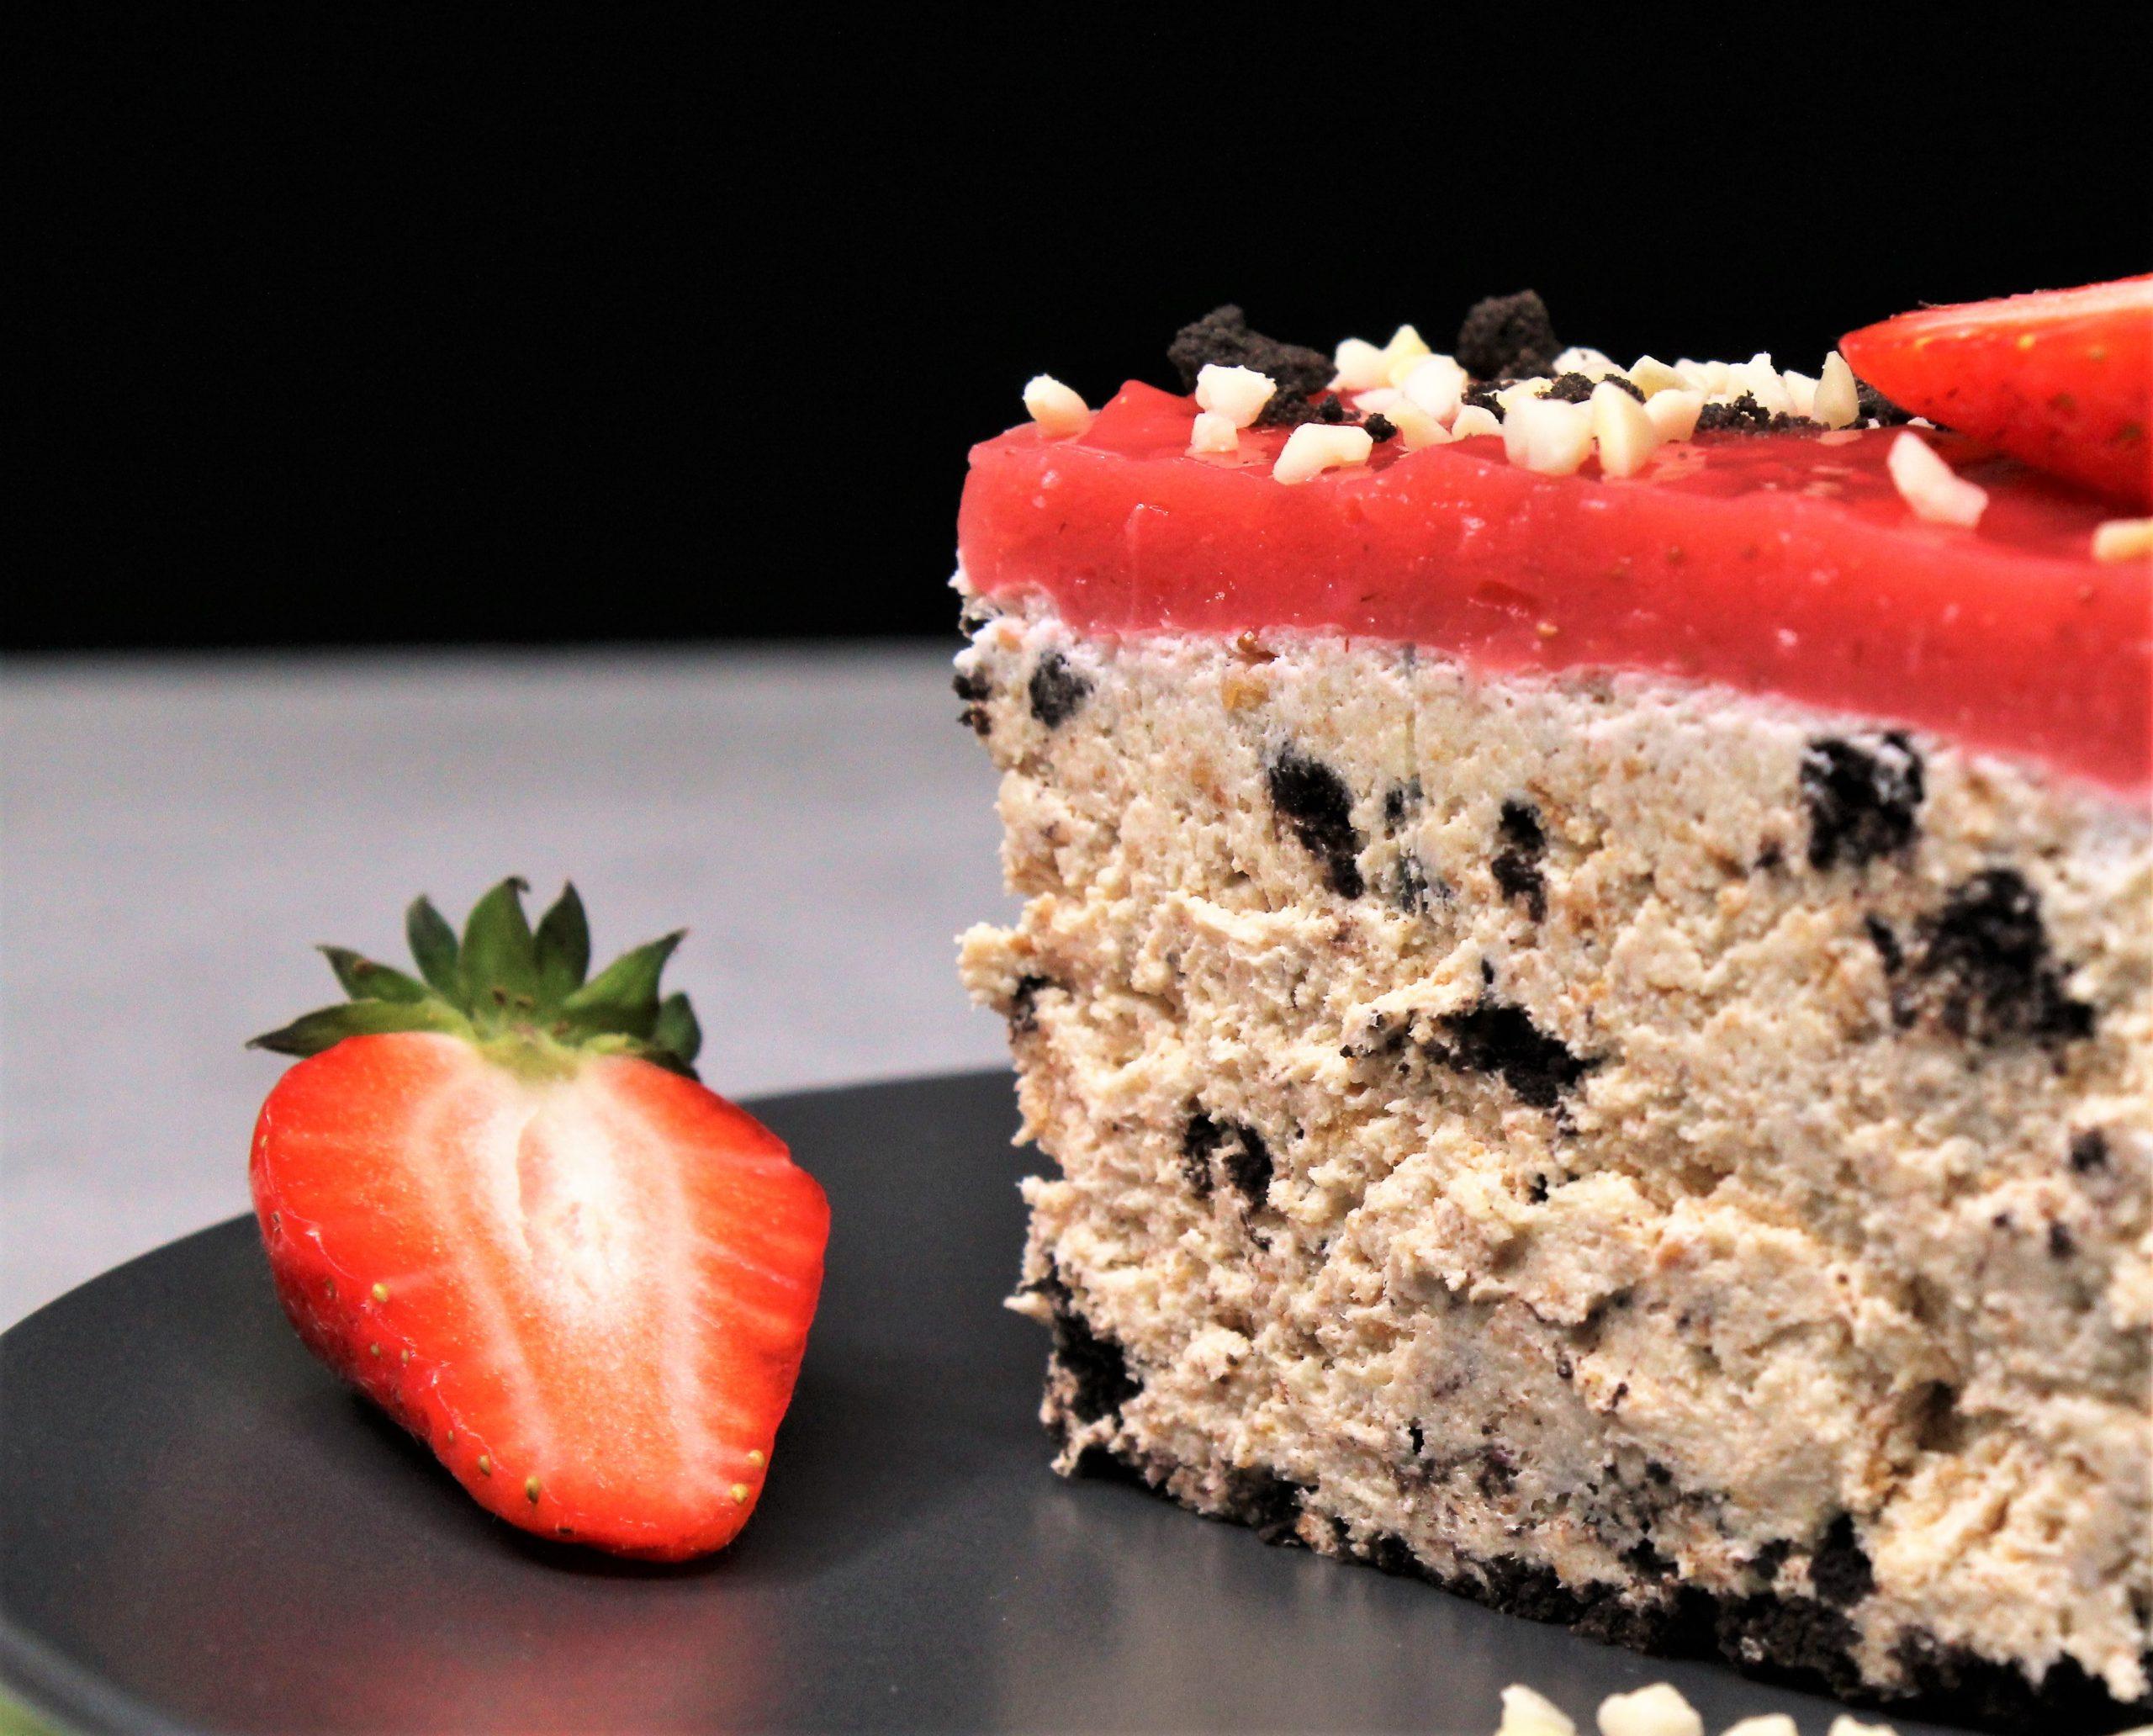 Recept nedelje: Torta lenja žena sa jagodama 2